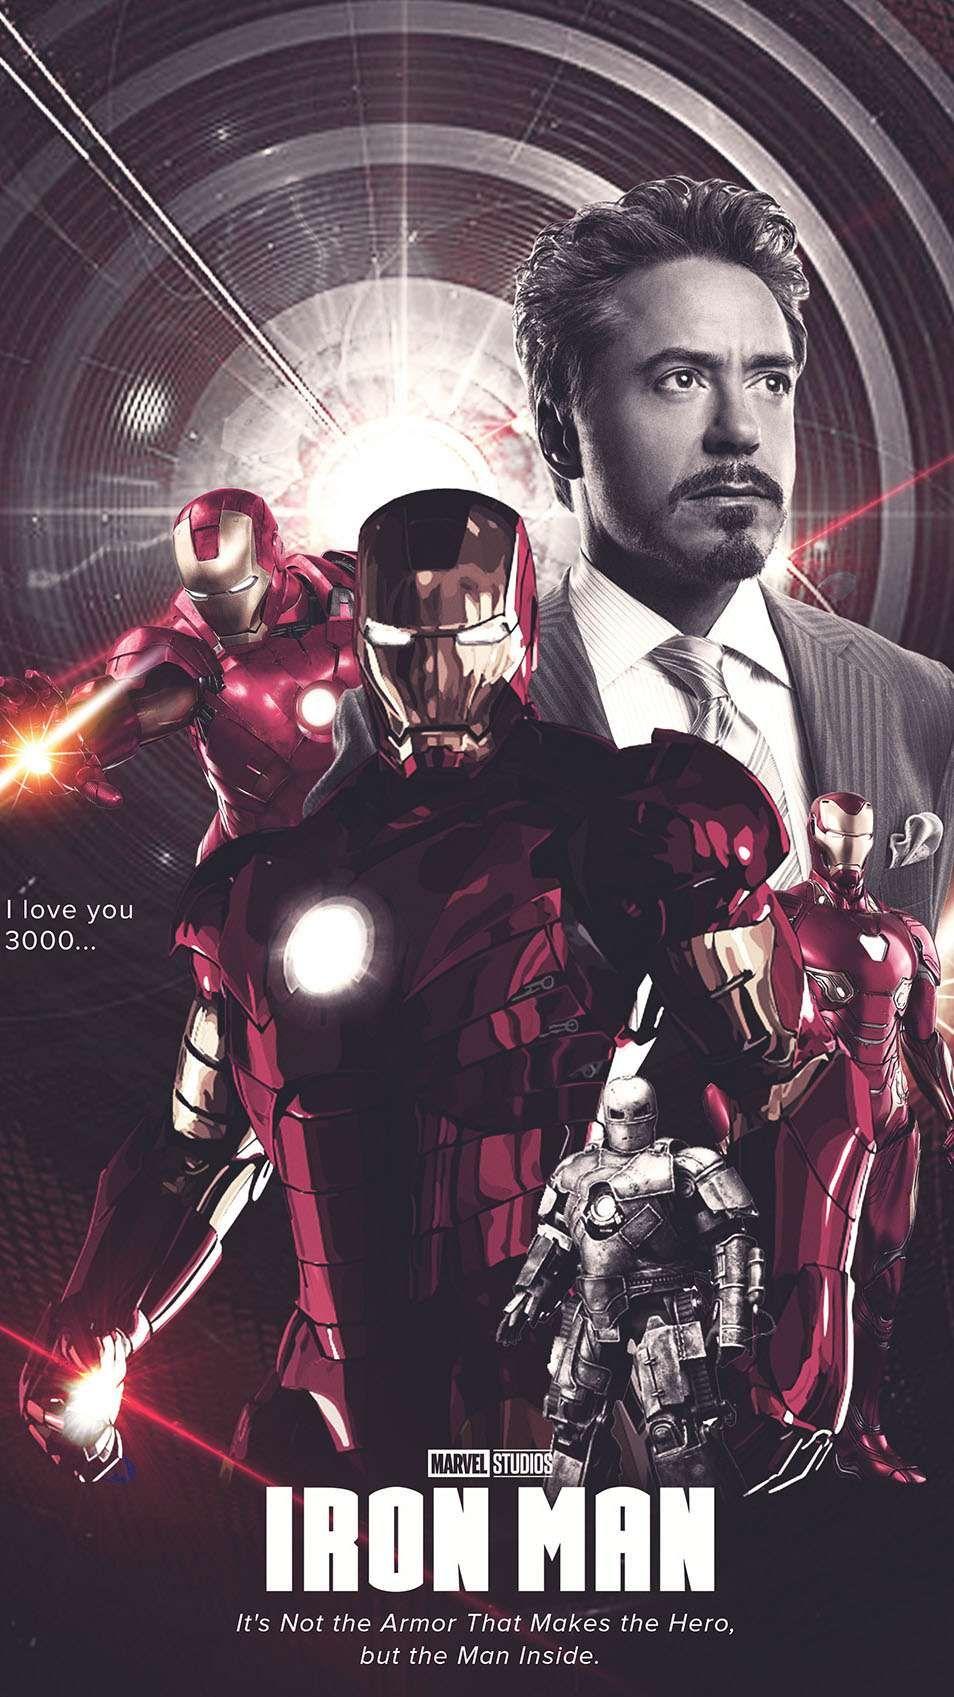 History of iron man iphone wallpaper in 2020 iron man